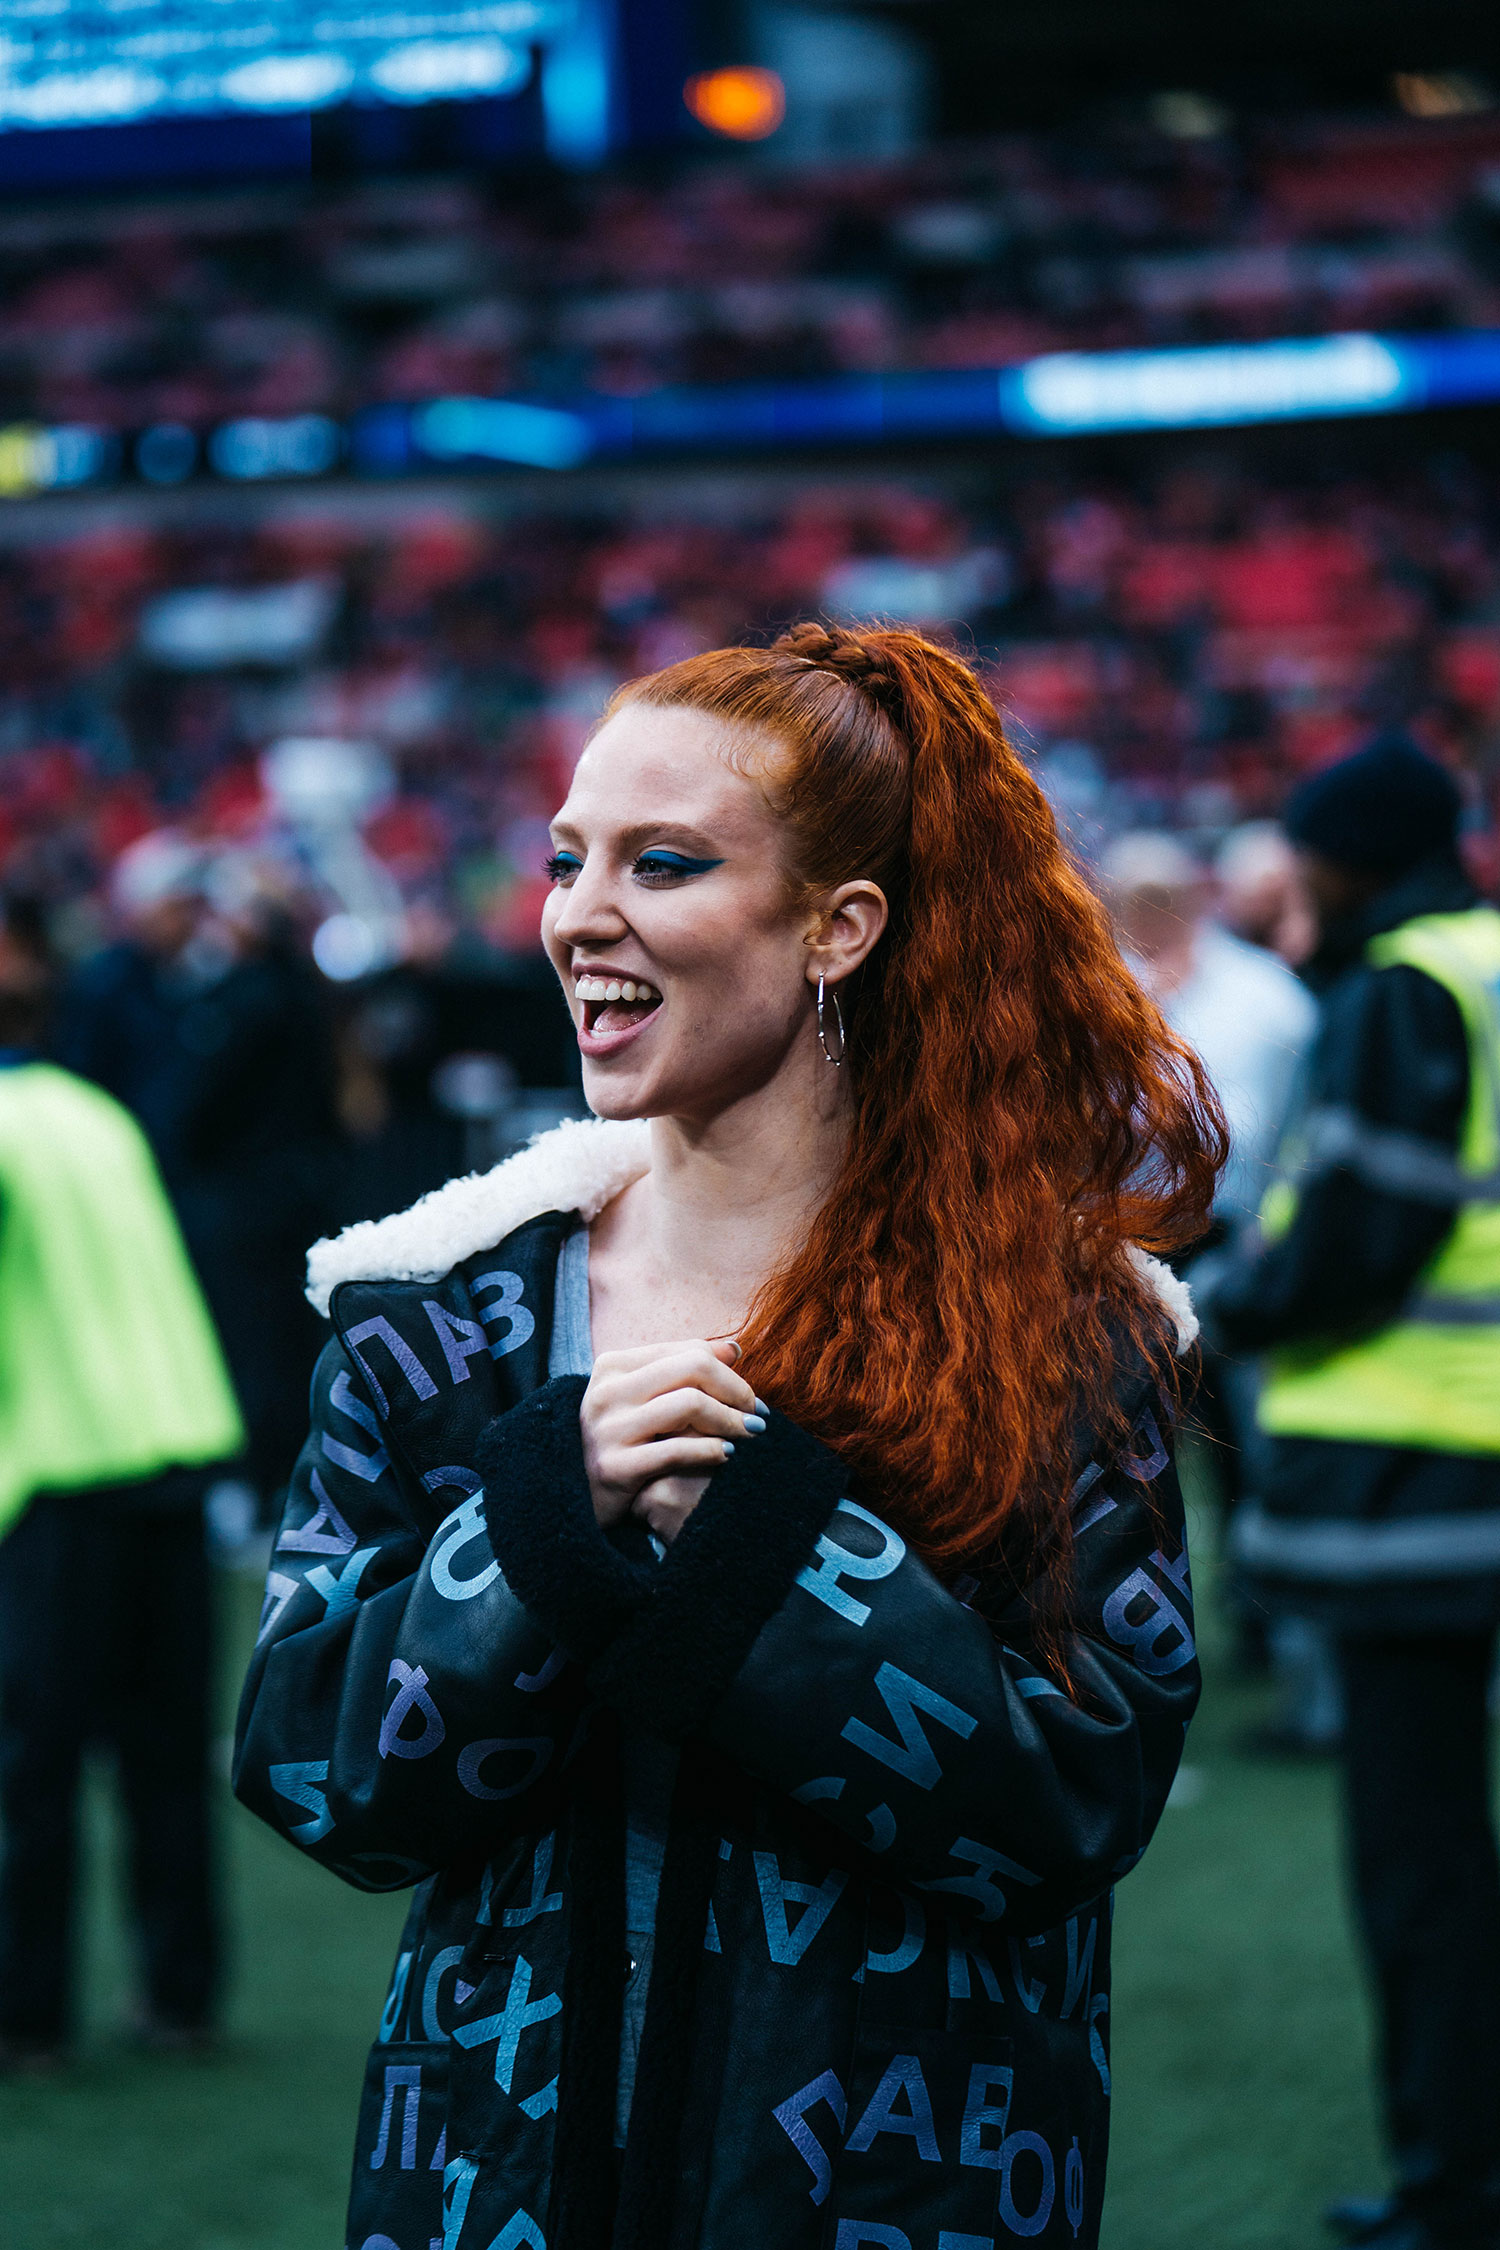 Jess Glynne at 2018 NFL